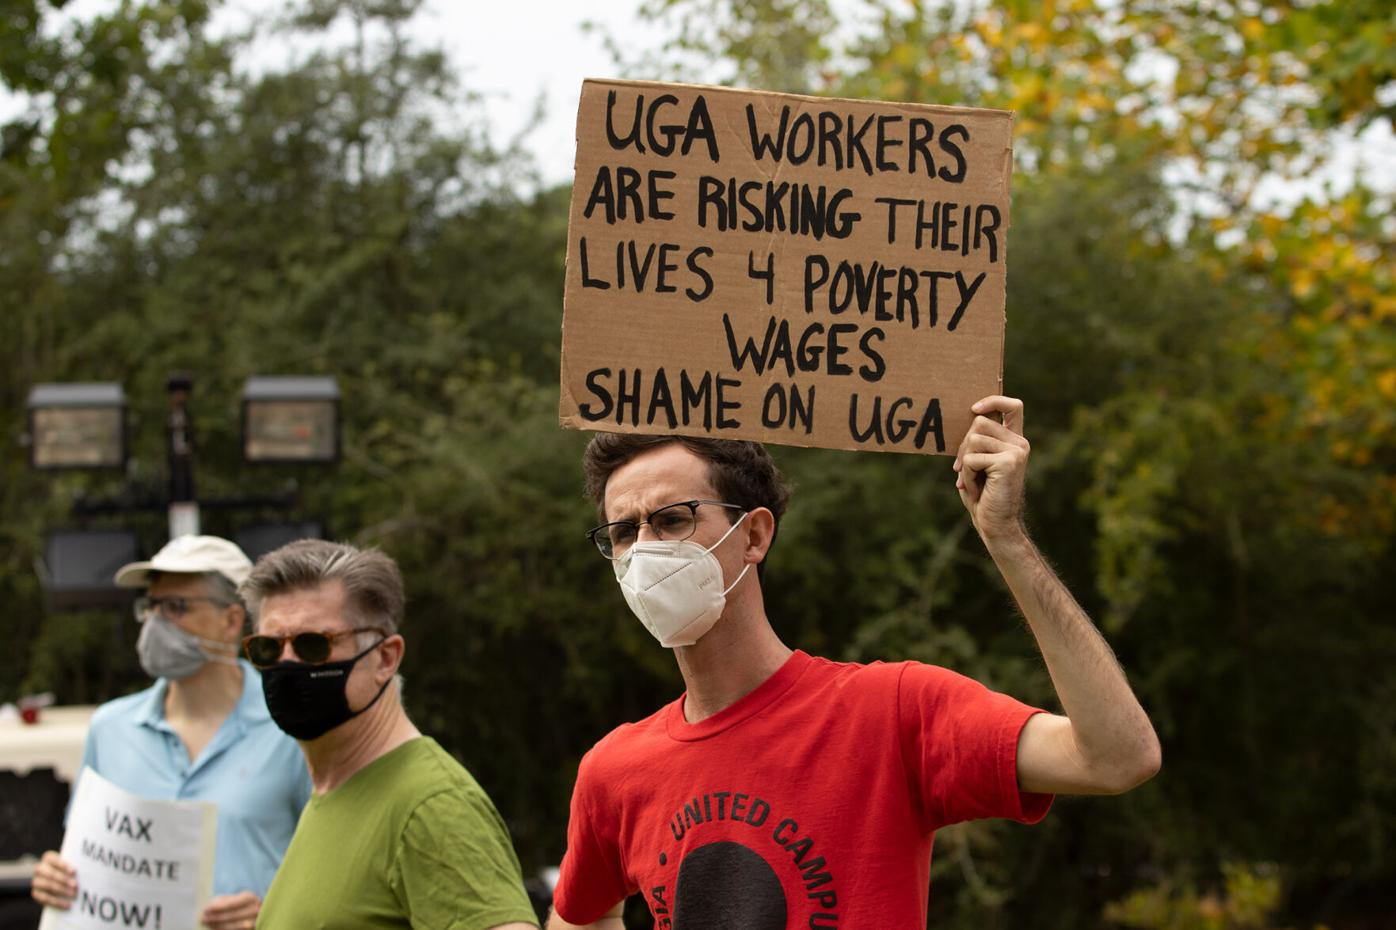 210915_JMW_9_15maskprotest_007.jpg